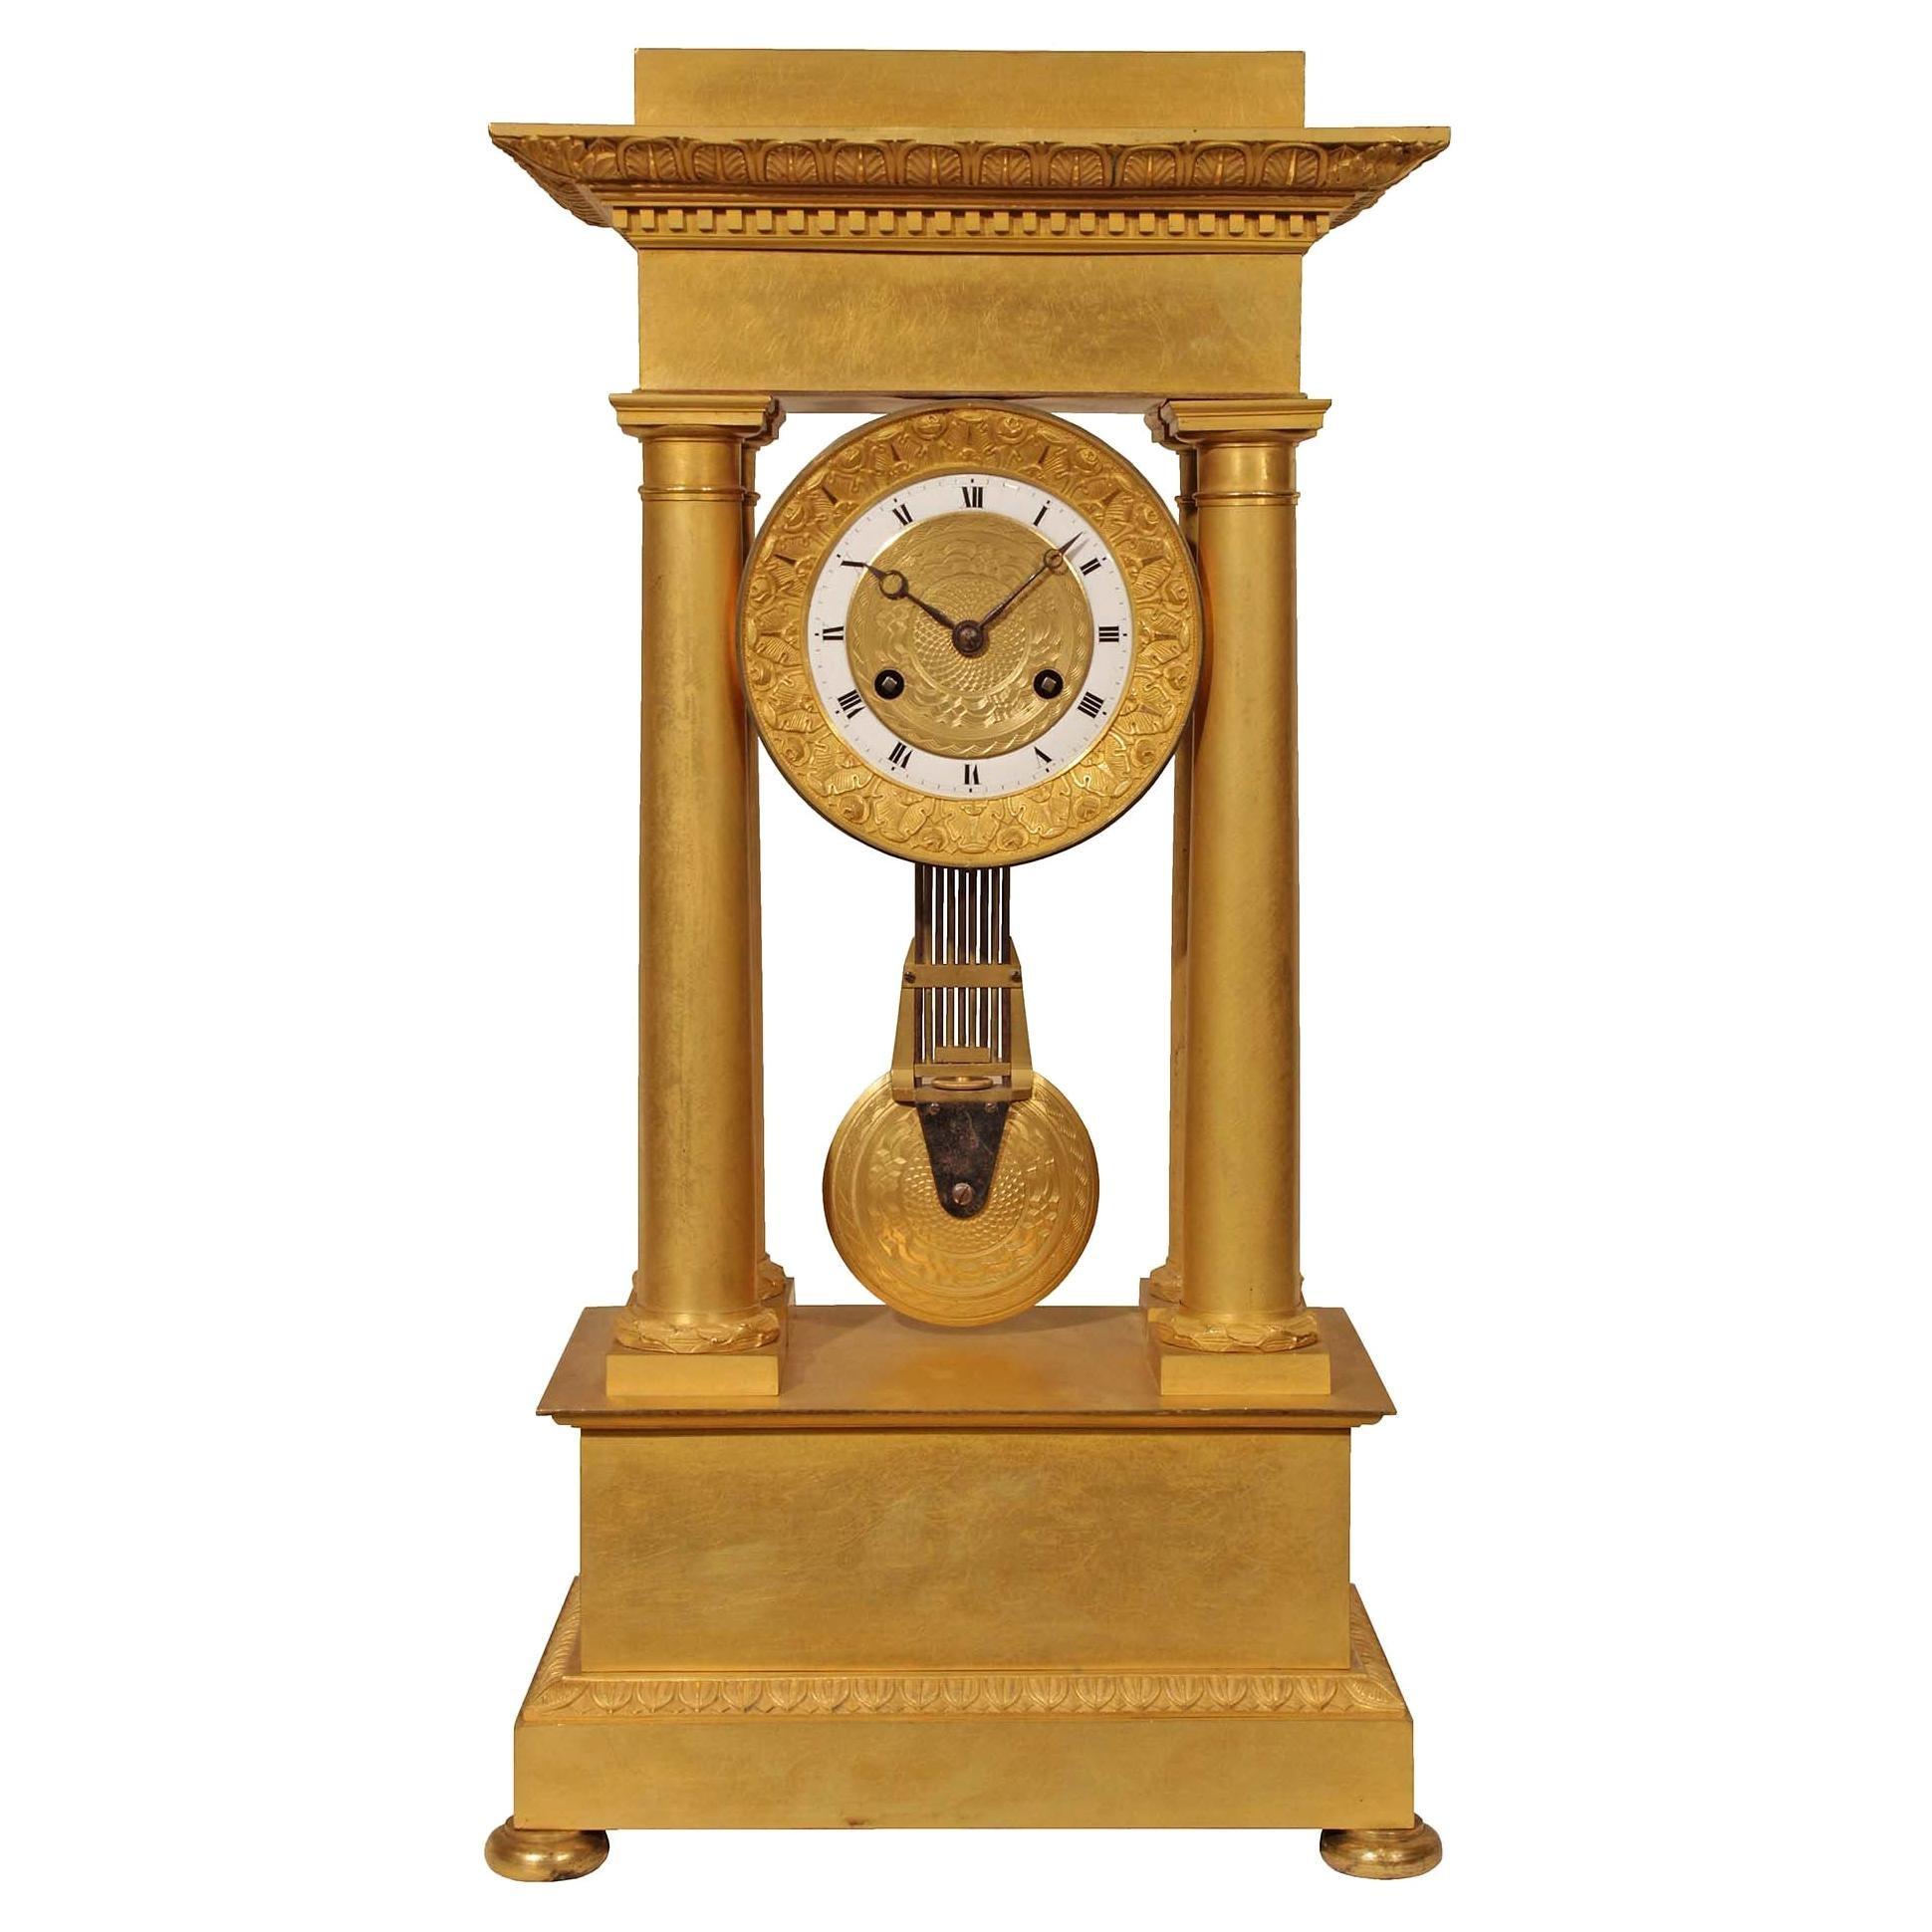 French Empire Style Mid-19th Century Ormolu Clock